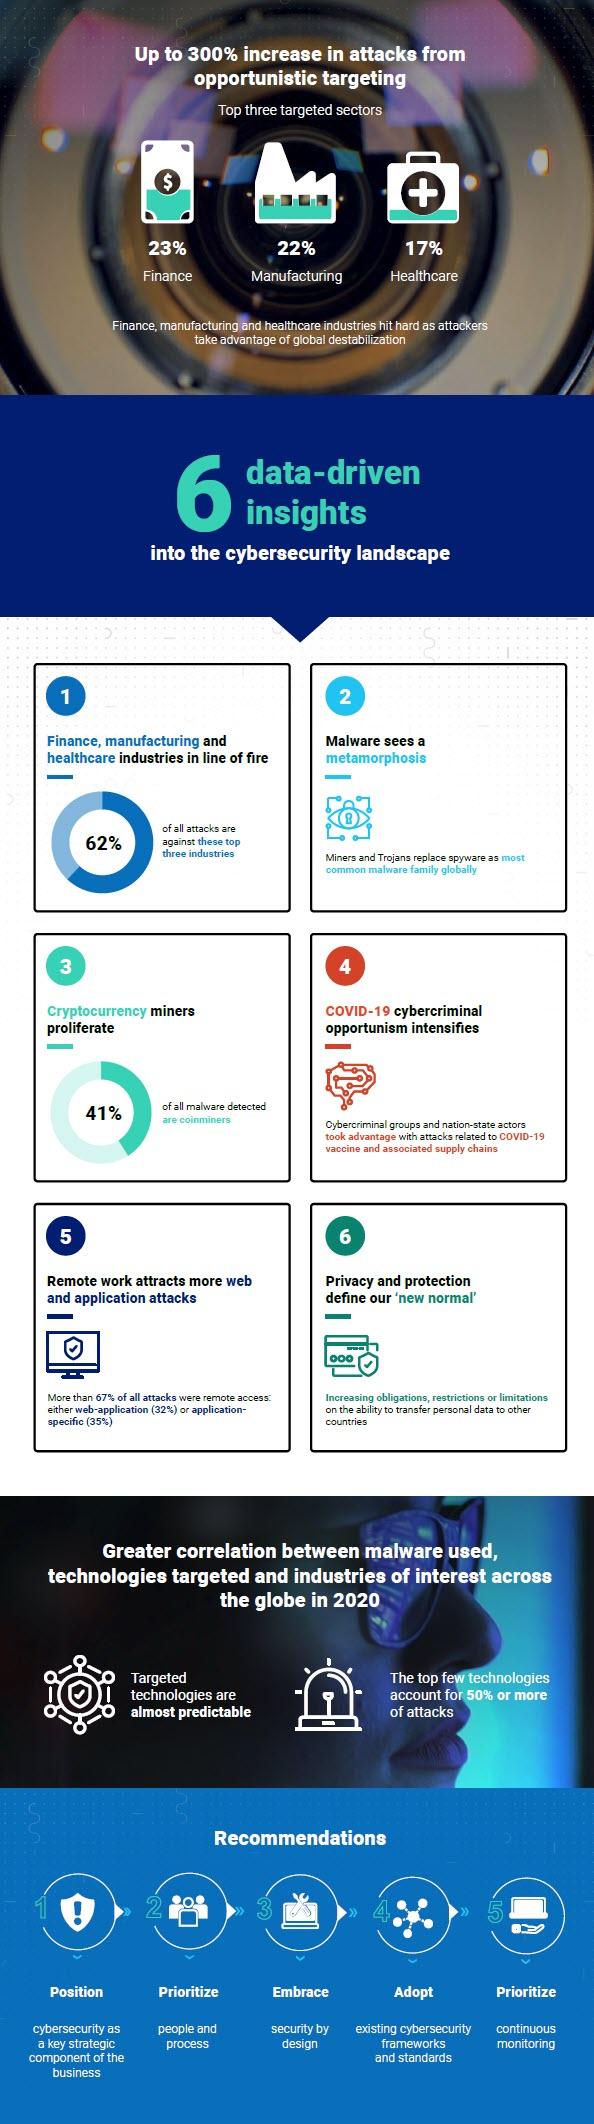 Ntt Global Threat Report 2021 - Infografica riassuntiva